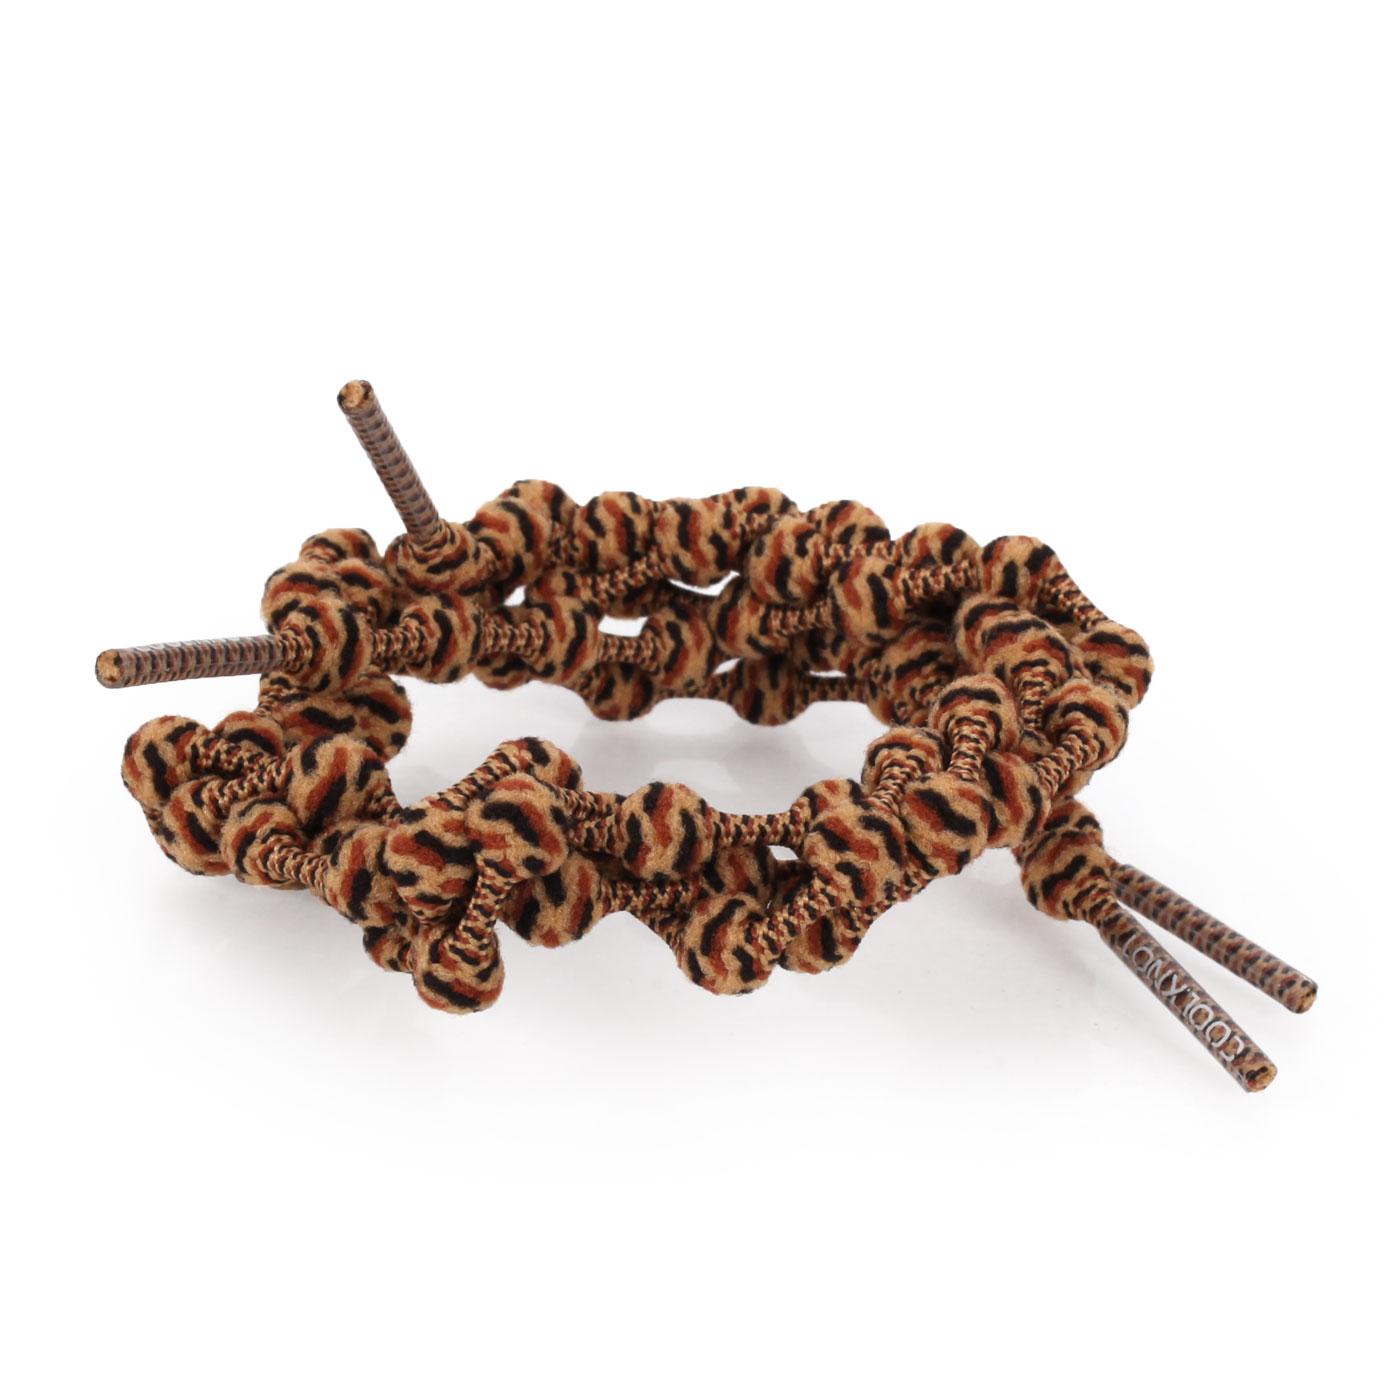 COOLKNOT 豆豆鞋帶(舒適款)60CM 6026201 - 豹紋黑咖啡